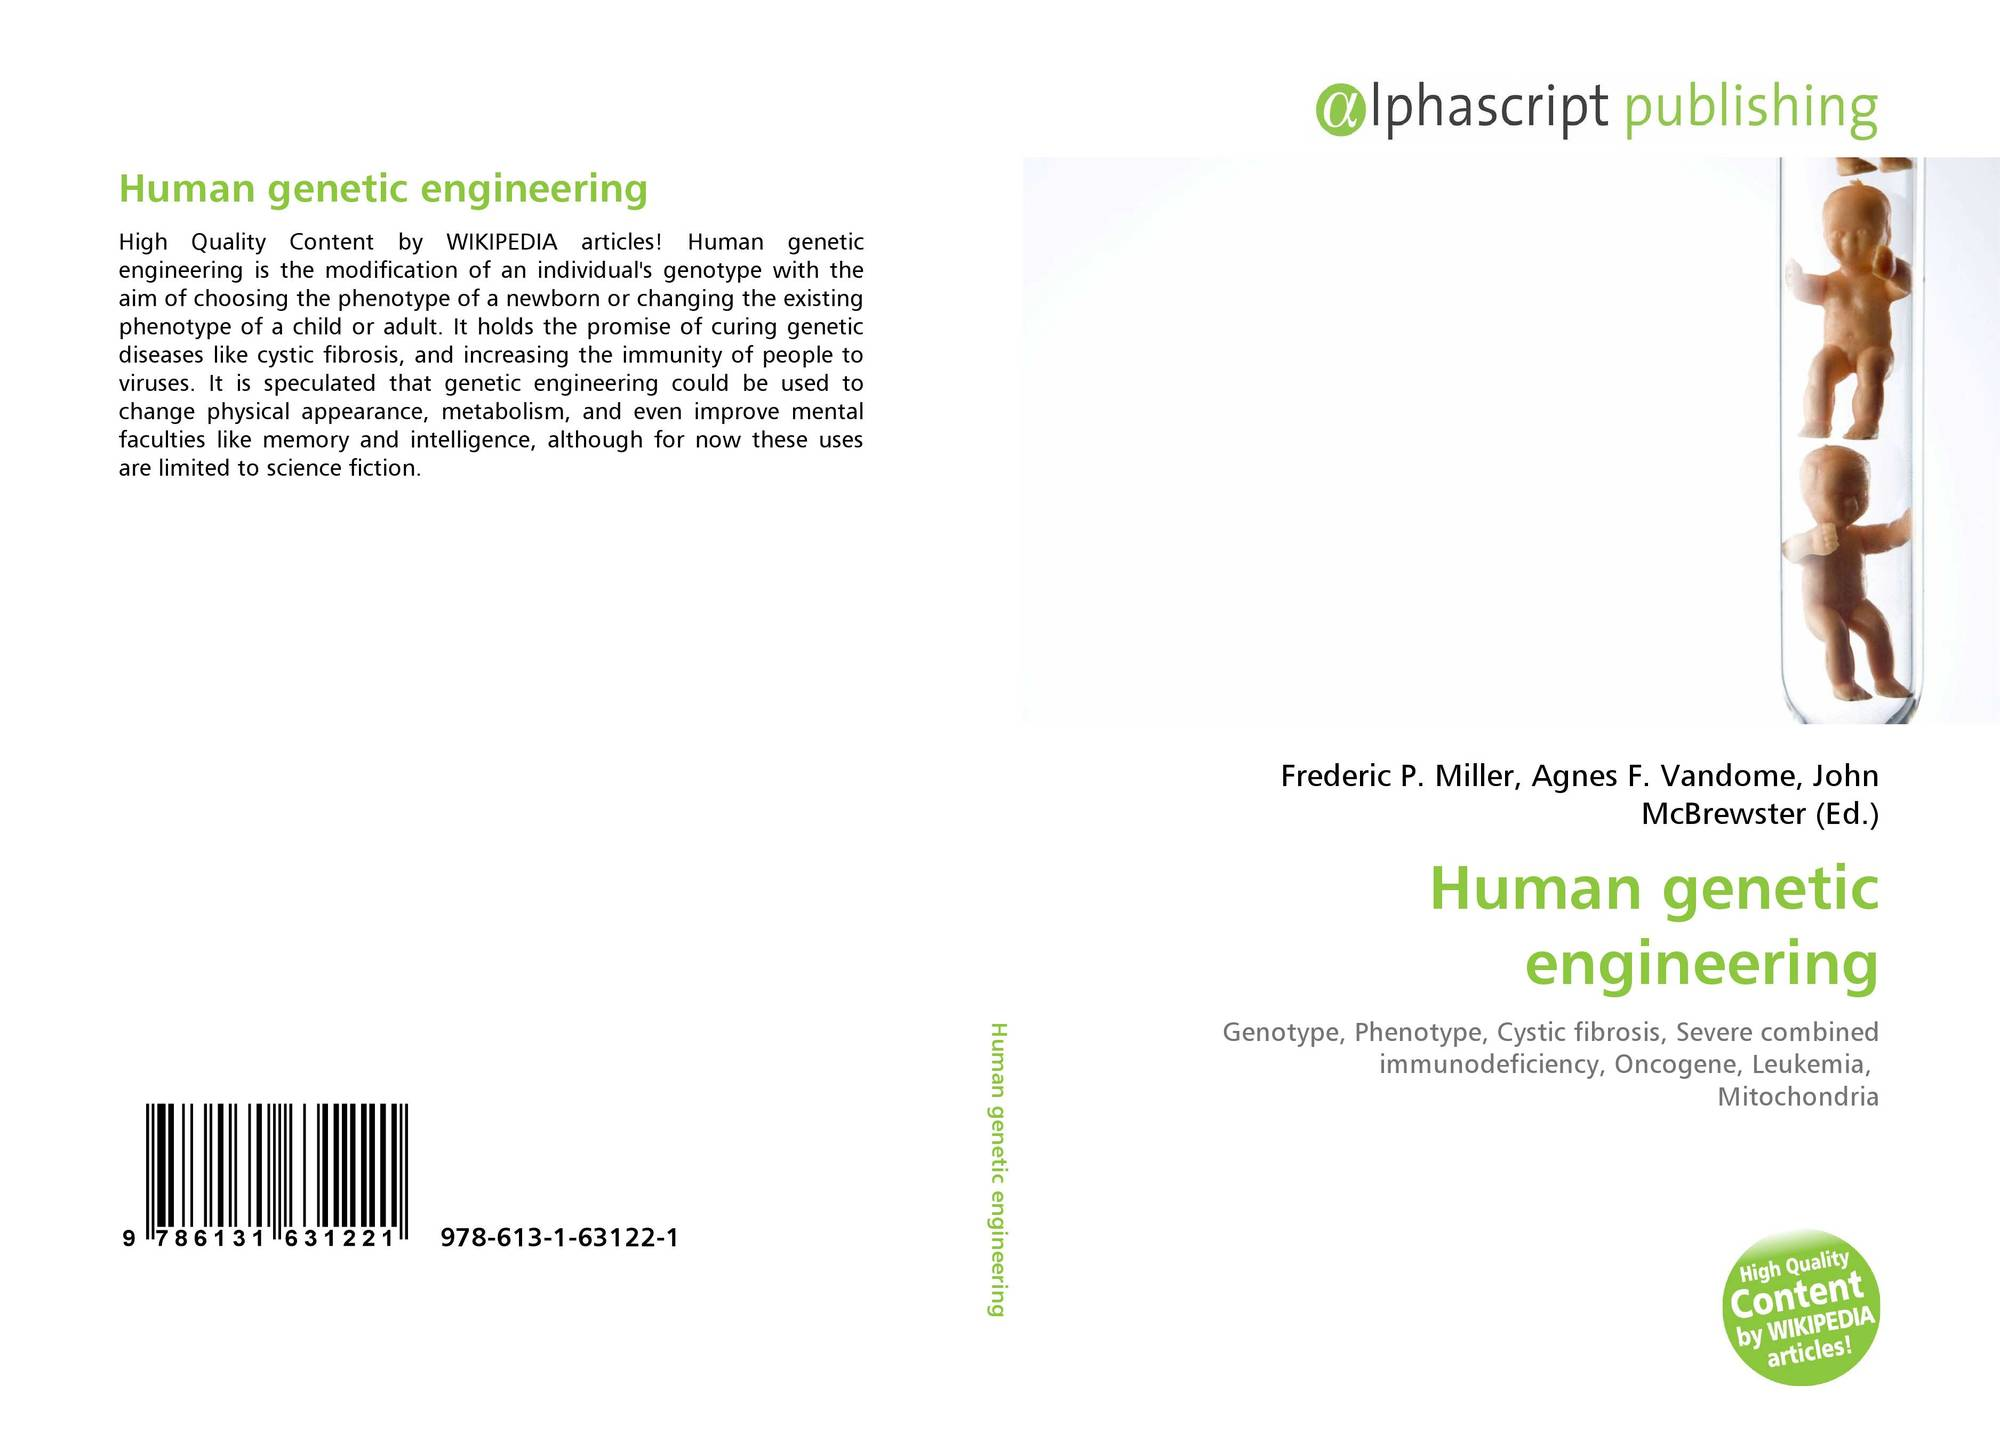 Genetic engineering wikipedia - Bookcover Of Human Genetic Engineering